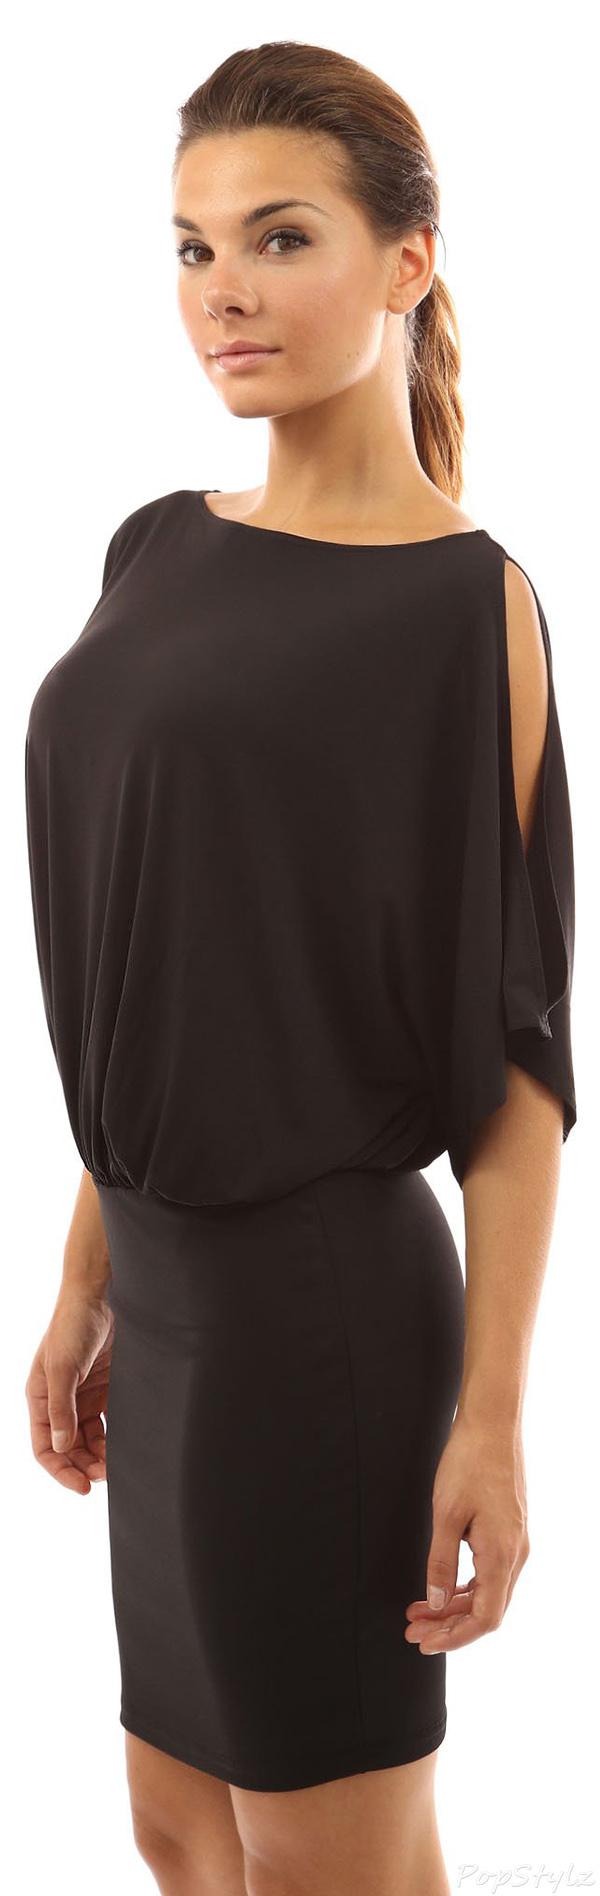 PattyBoutik Cold Shoulder Bat Wing Dress